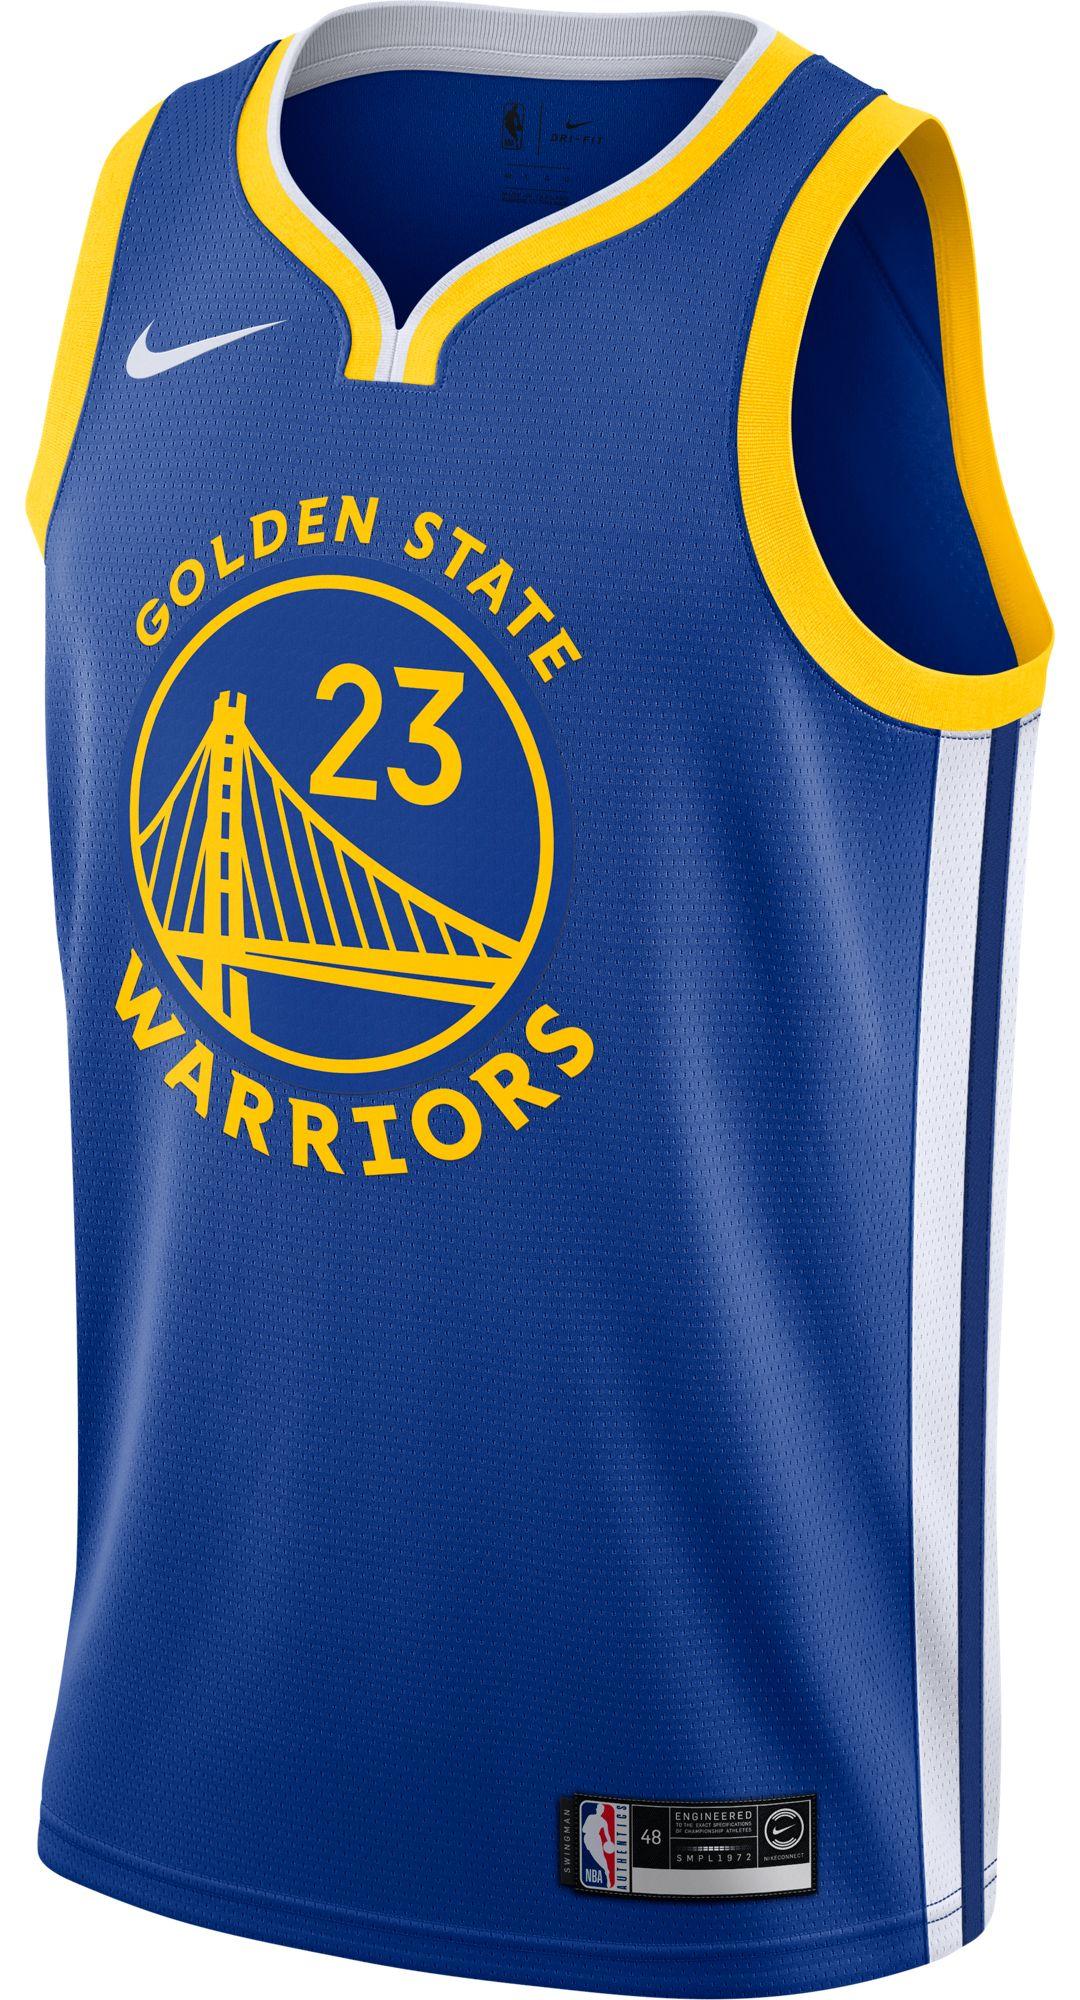 size 40 b6173 cf1fc Nike Men's Golden State Warriors Draymond Green #23 Royal Dri-FIT Swingman  Jersey